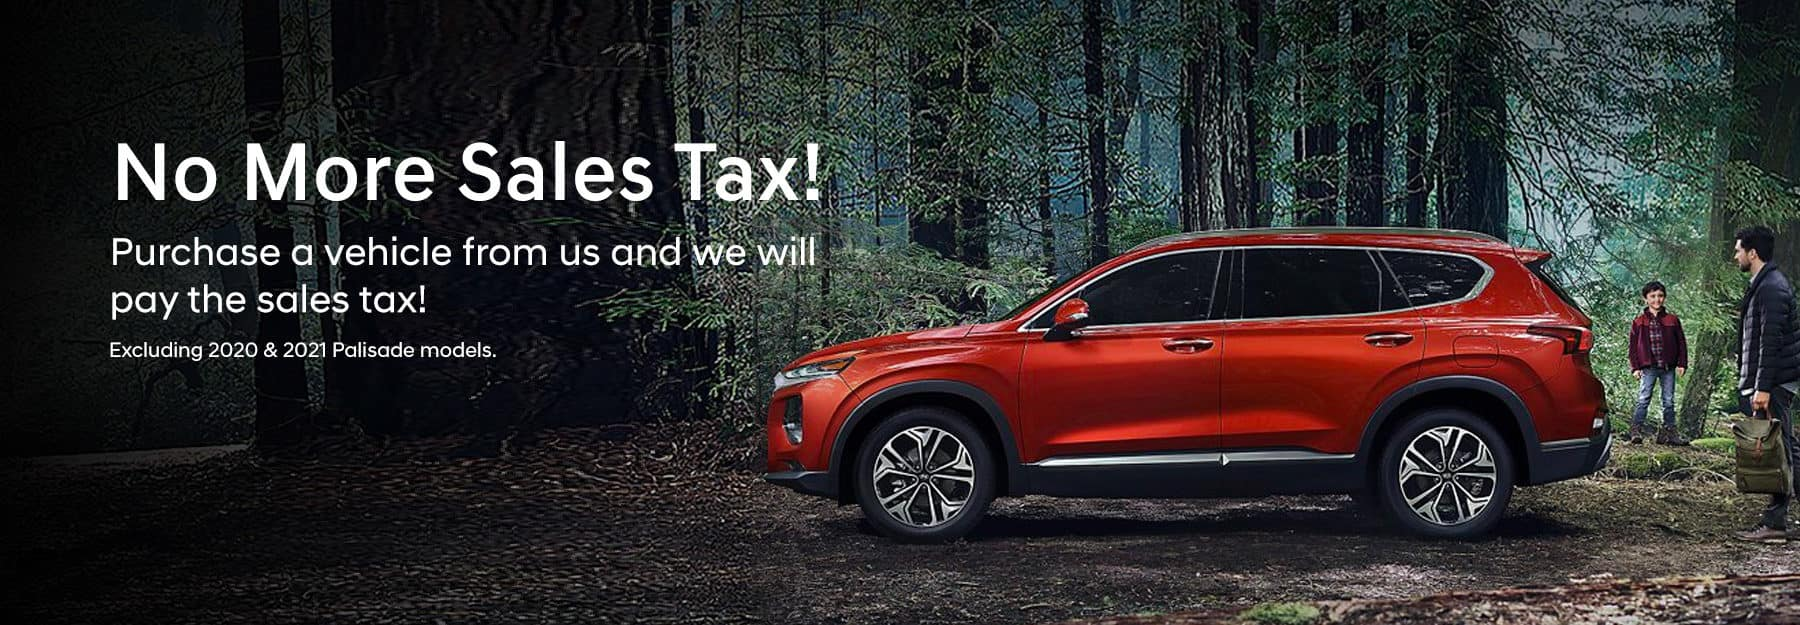 Hyundai_Tax_Free